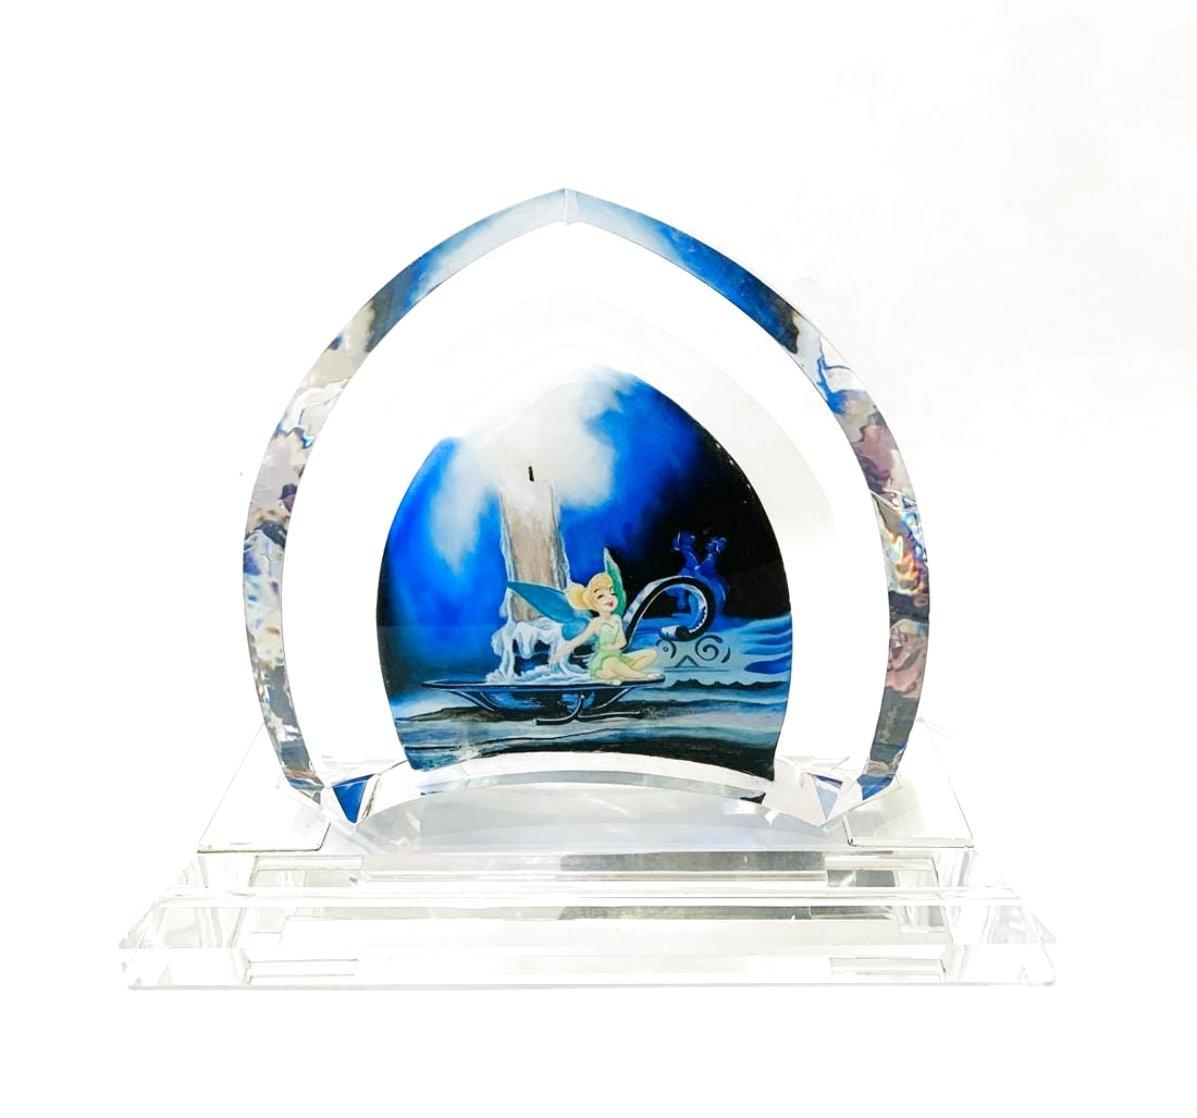 Tinkerbell Glass Sculpture 2007 9 in Sculpture by  Courvoisier Disney Cels